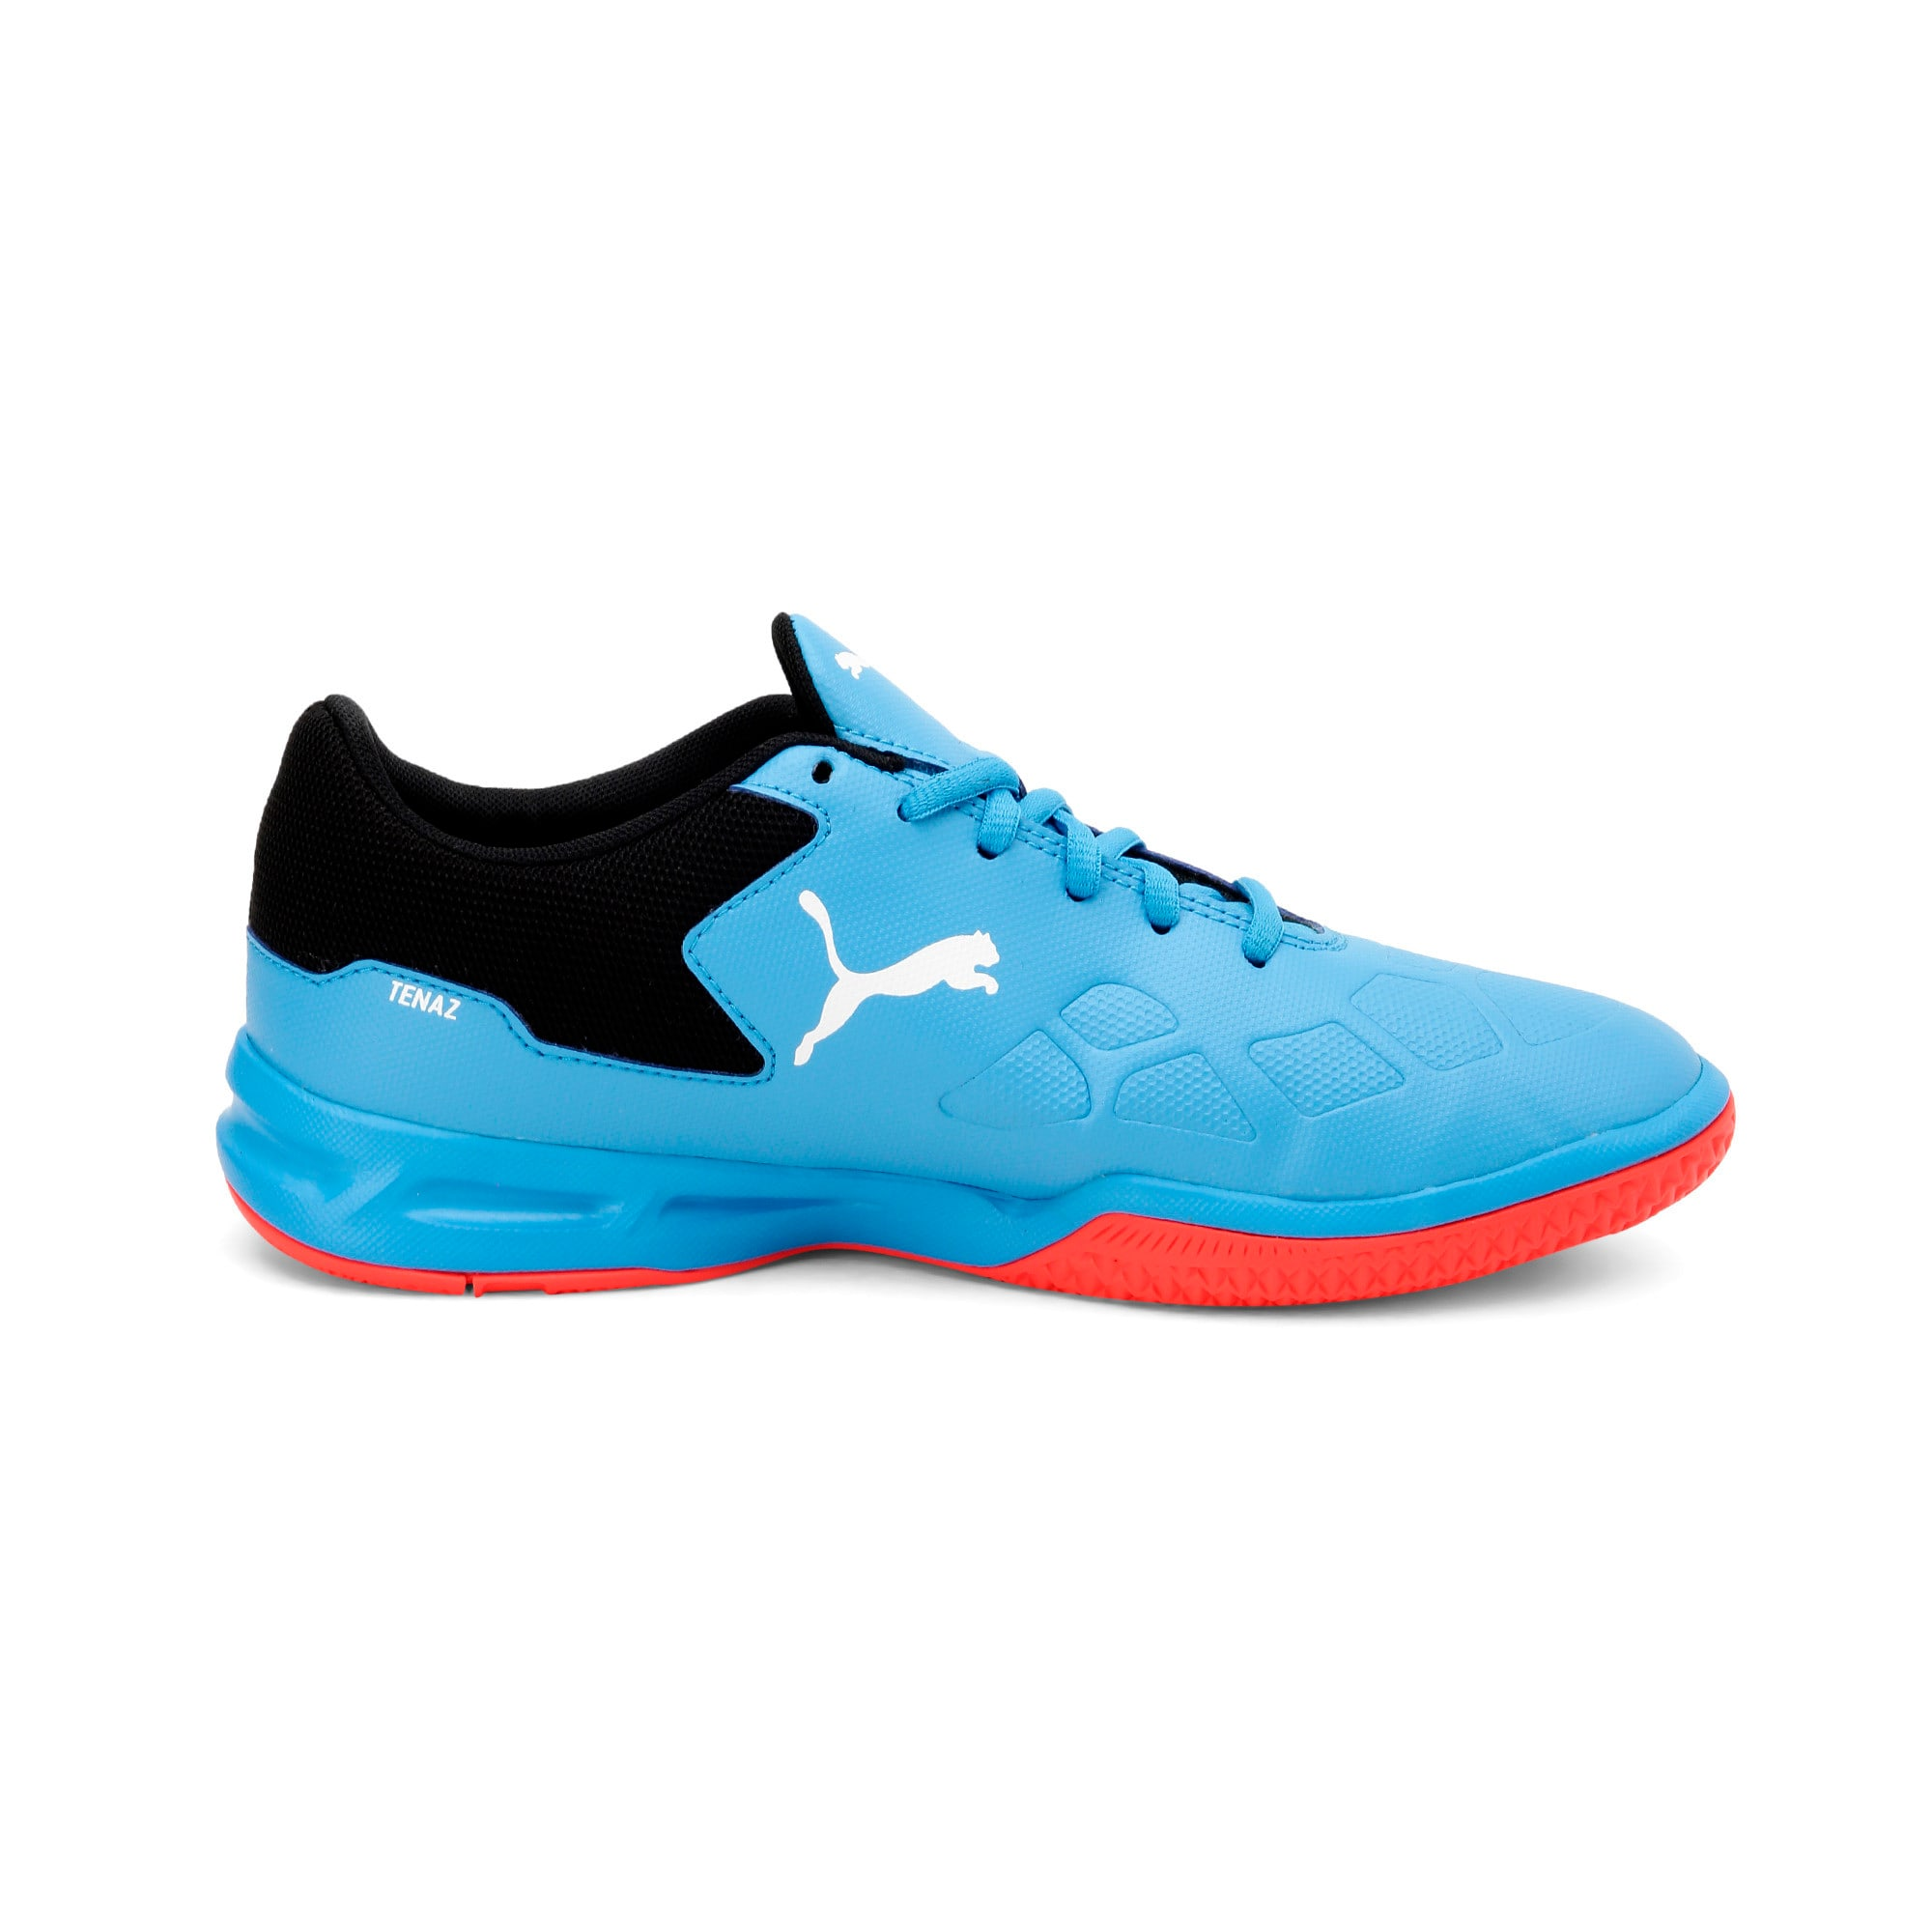 Thumbnail 5 of Tenaz Kids' Indoor Teamsport Shoes, Bleu Azur-White-Black-Red, medium-IND